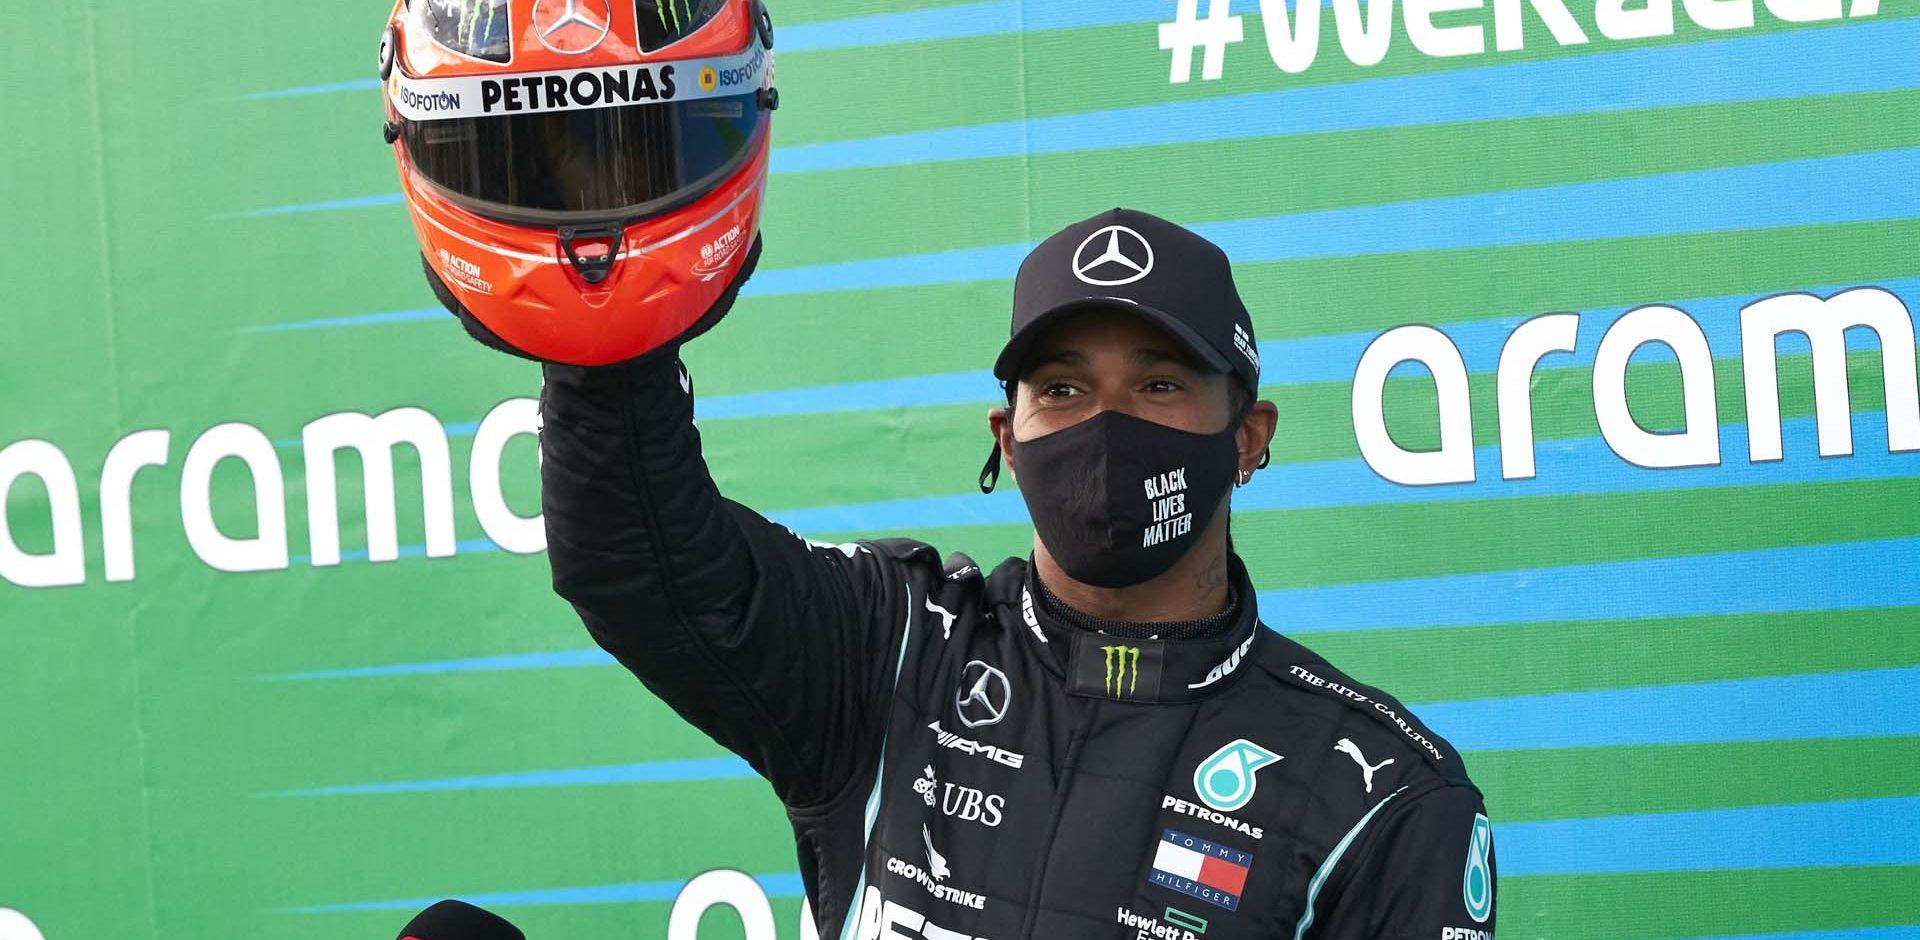 2020 Eifel Grand Prix, Sunday - Steve Etherington Lewis Hamilton Mercedes Michael Schumacher's helmet